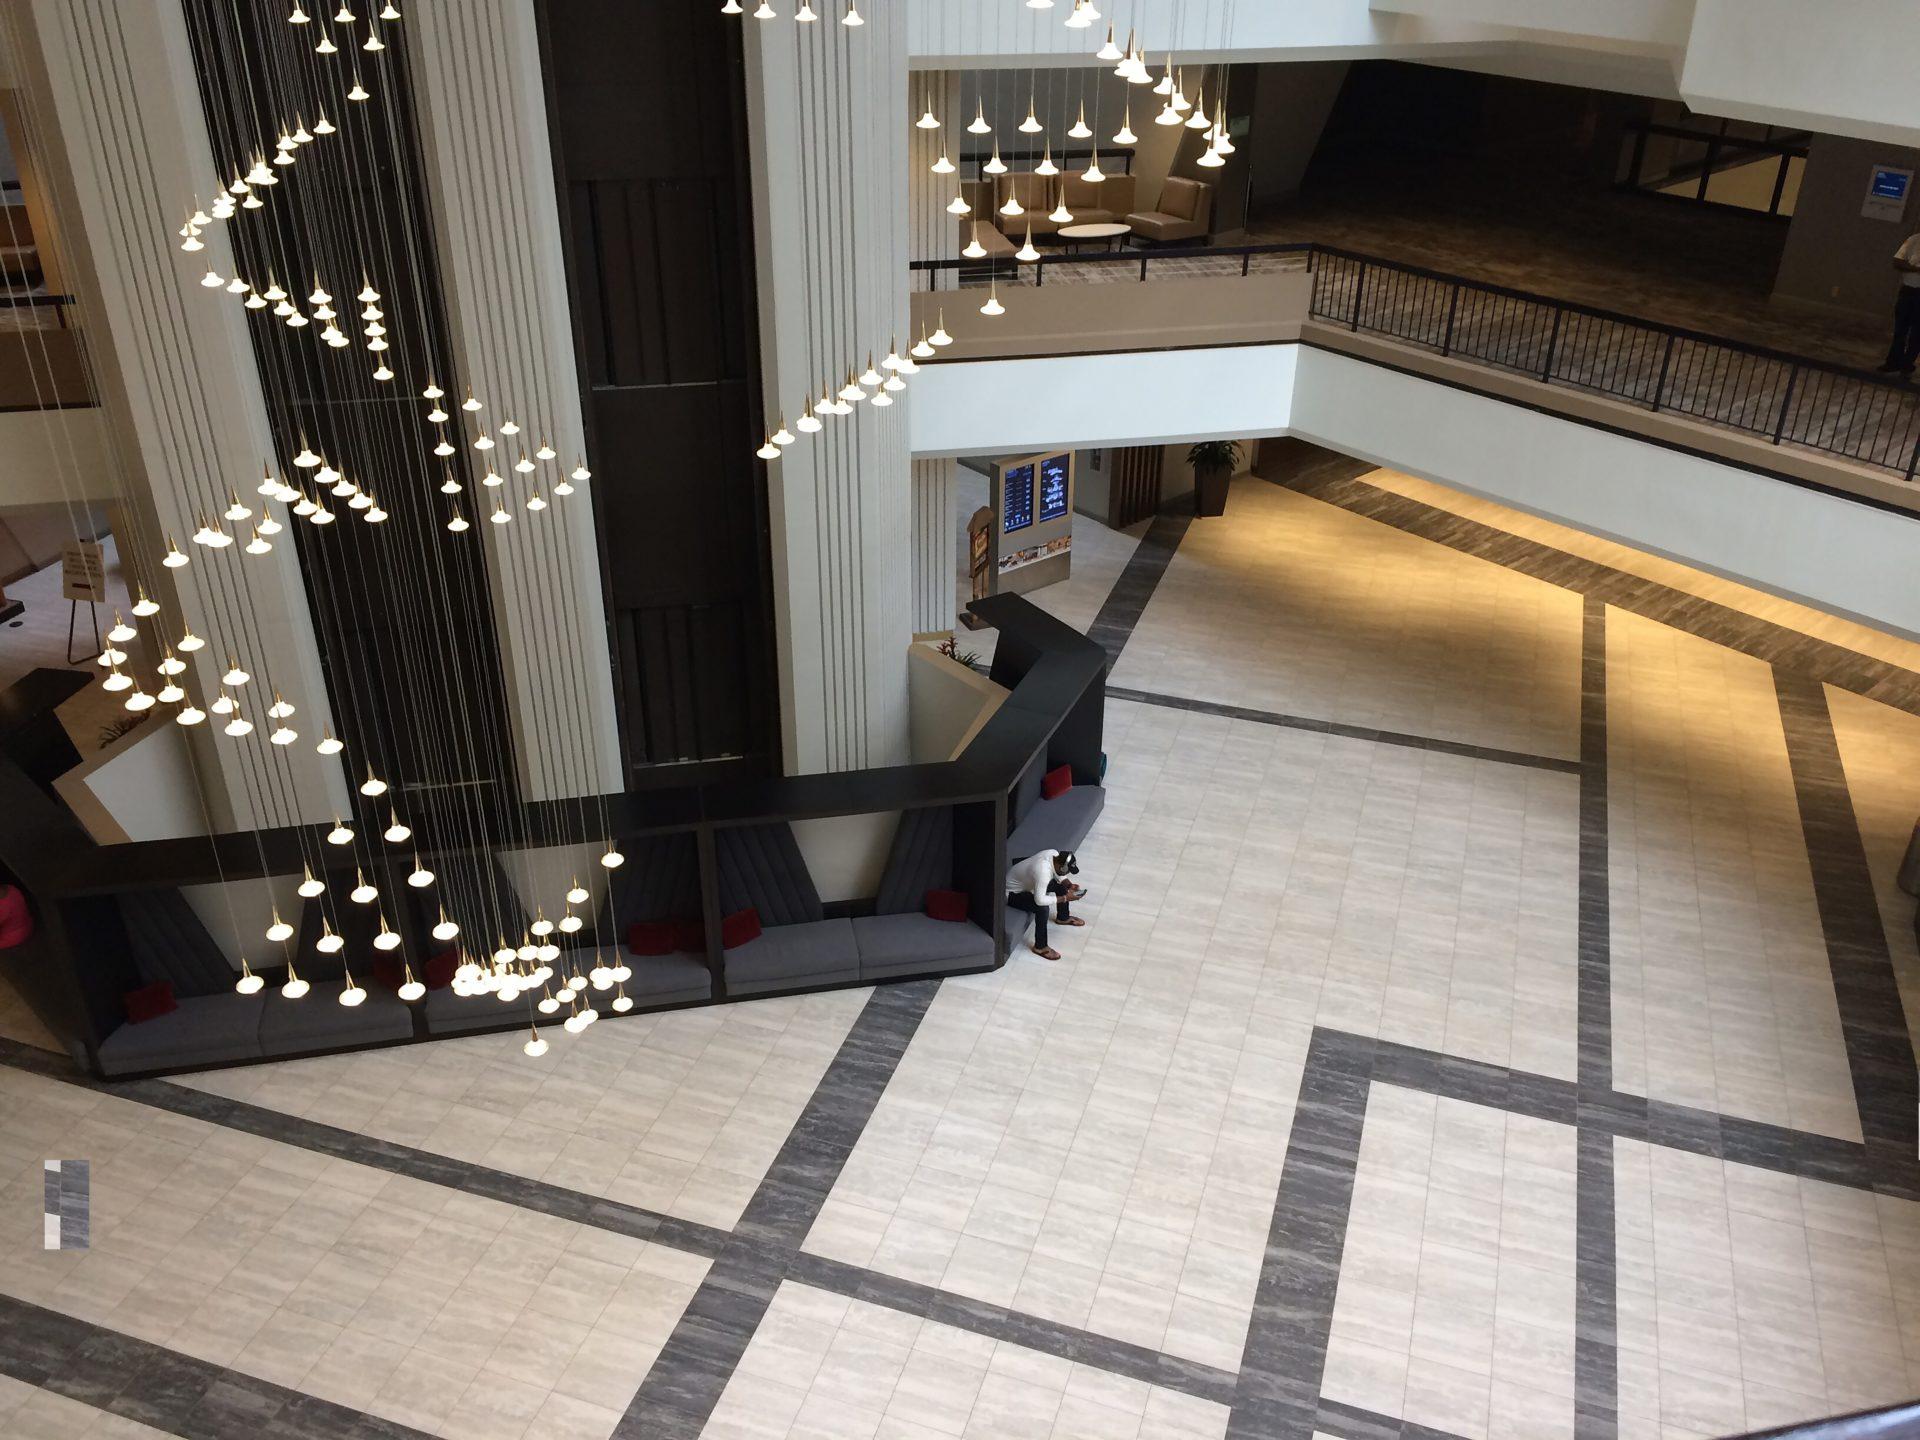 Newly Renovated Entrance at the Atlanta Hilton